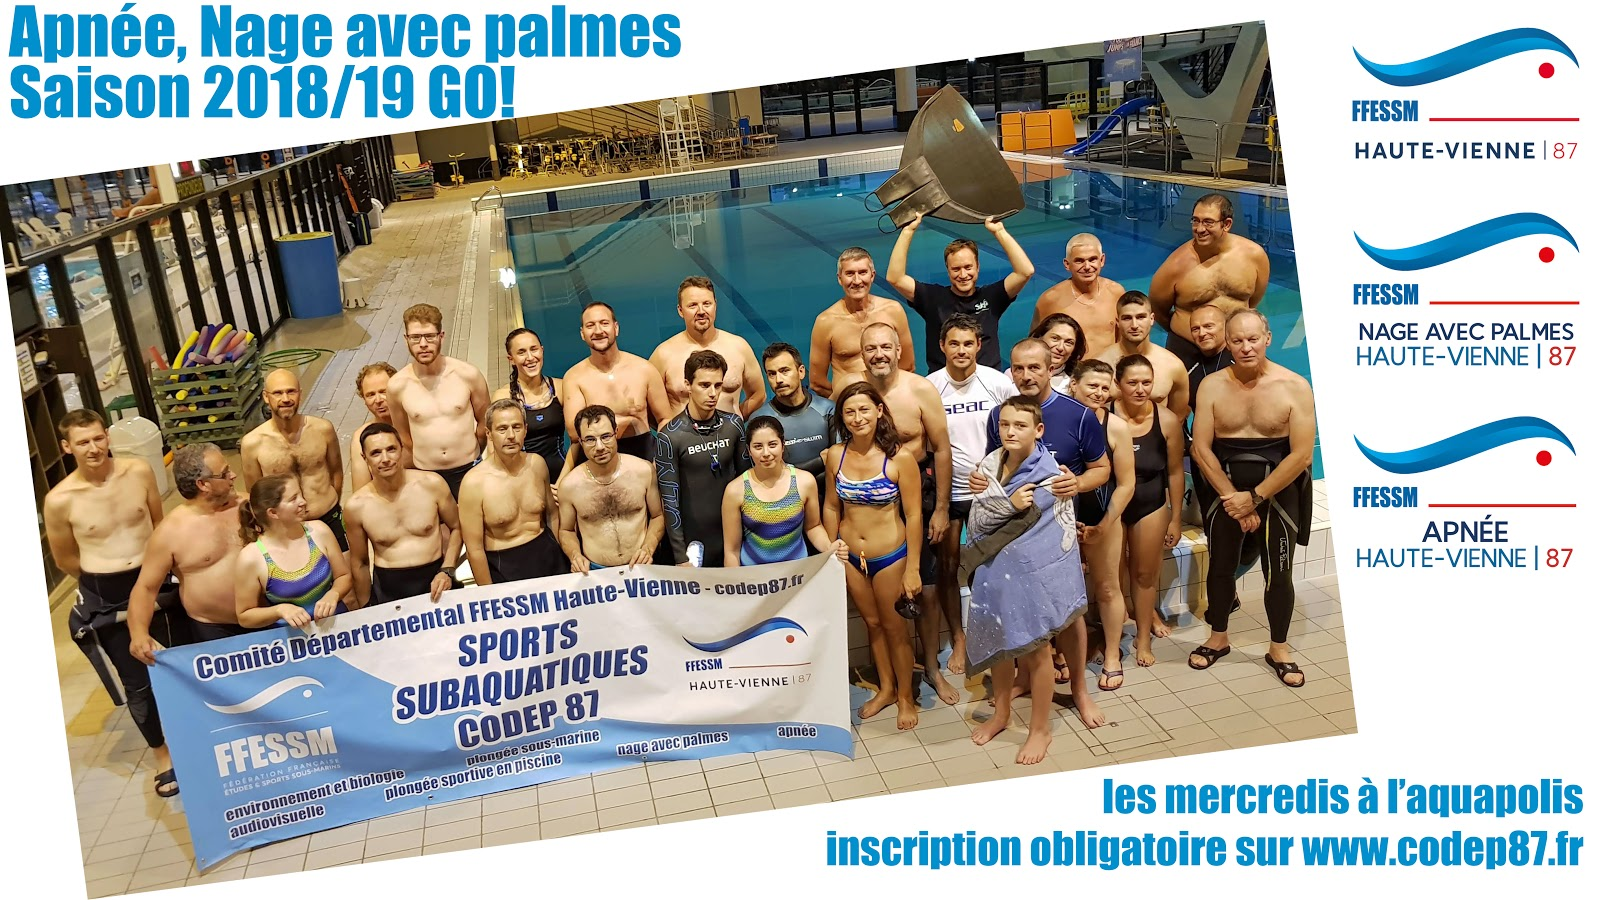 CODEP87 FFESSM Apnée nage avec palmes Aquapolis Limoges